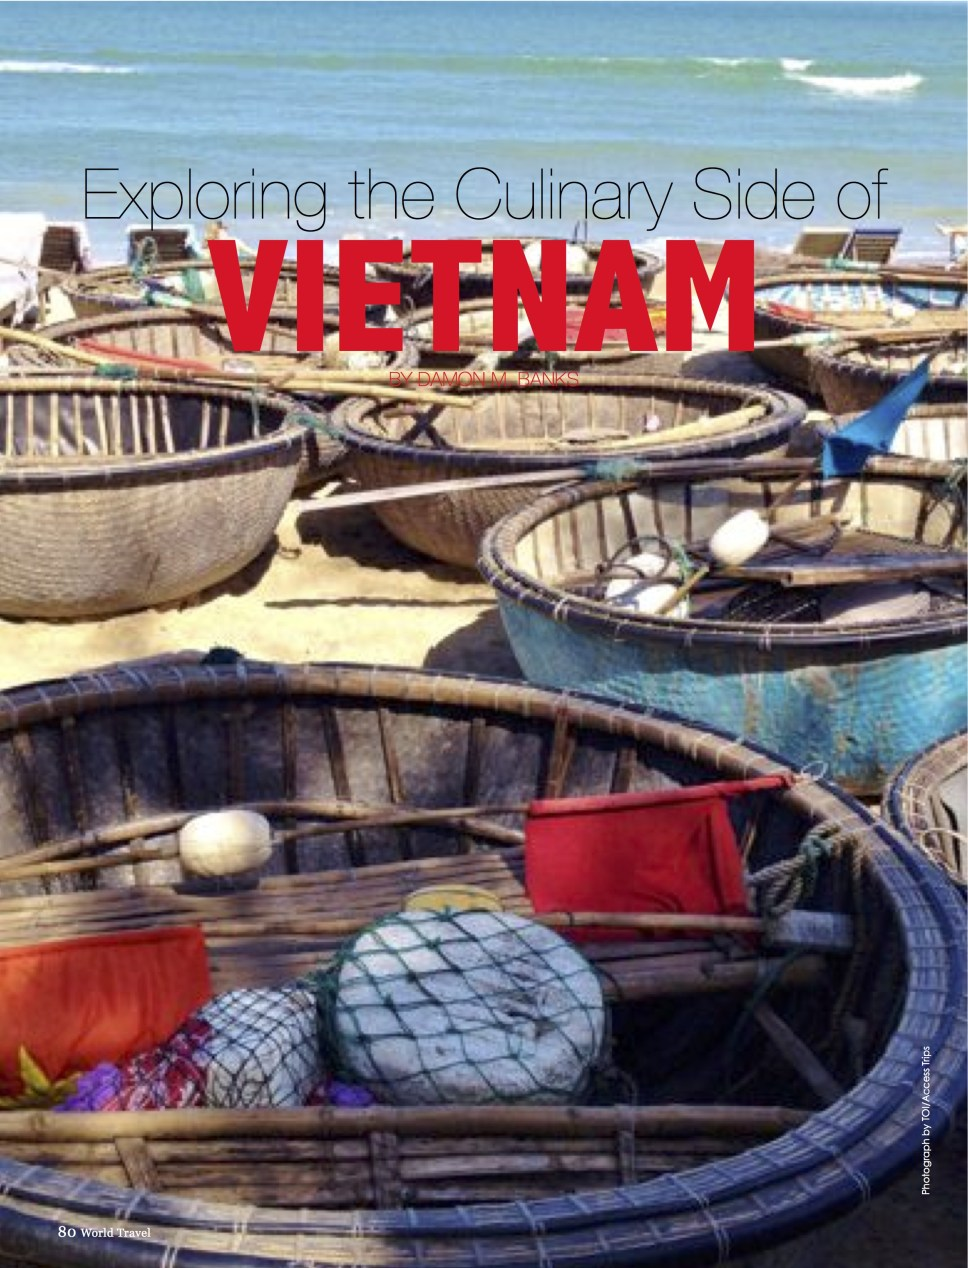 WTM_Vietnam_Damon-M-Banks_1